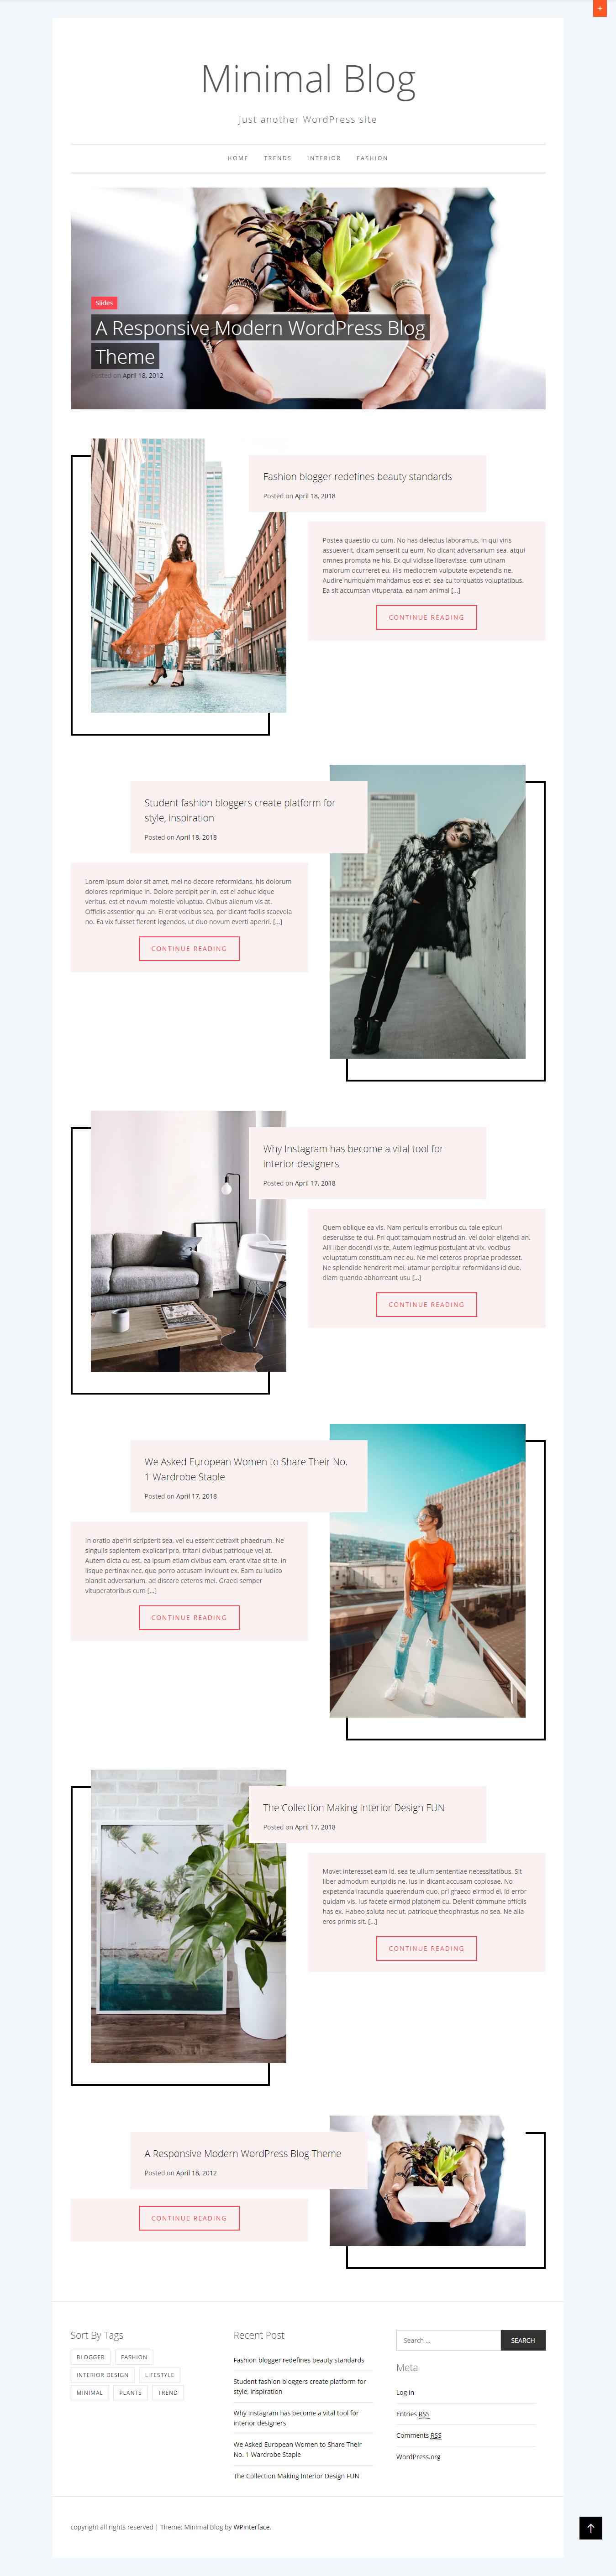 minimal blog best free minimal wordpress theme - 10+ Best Free Minimal WordPress Themes